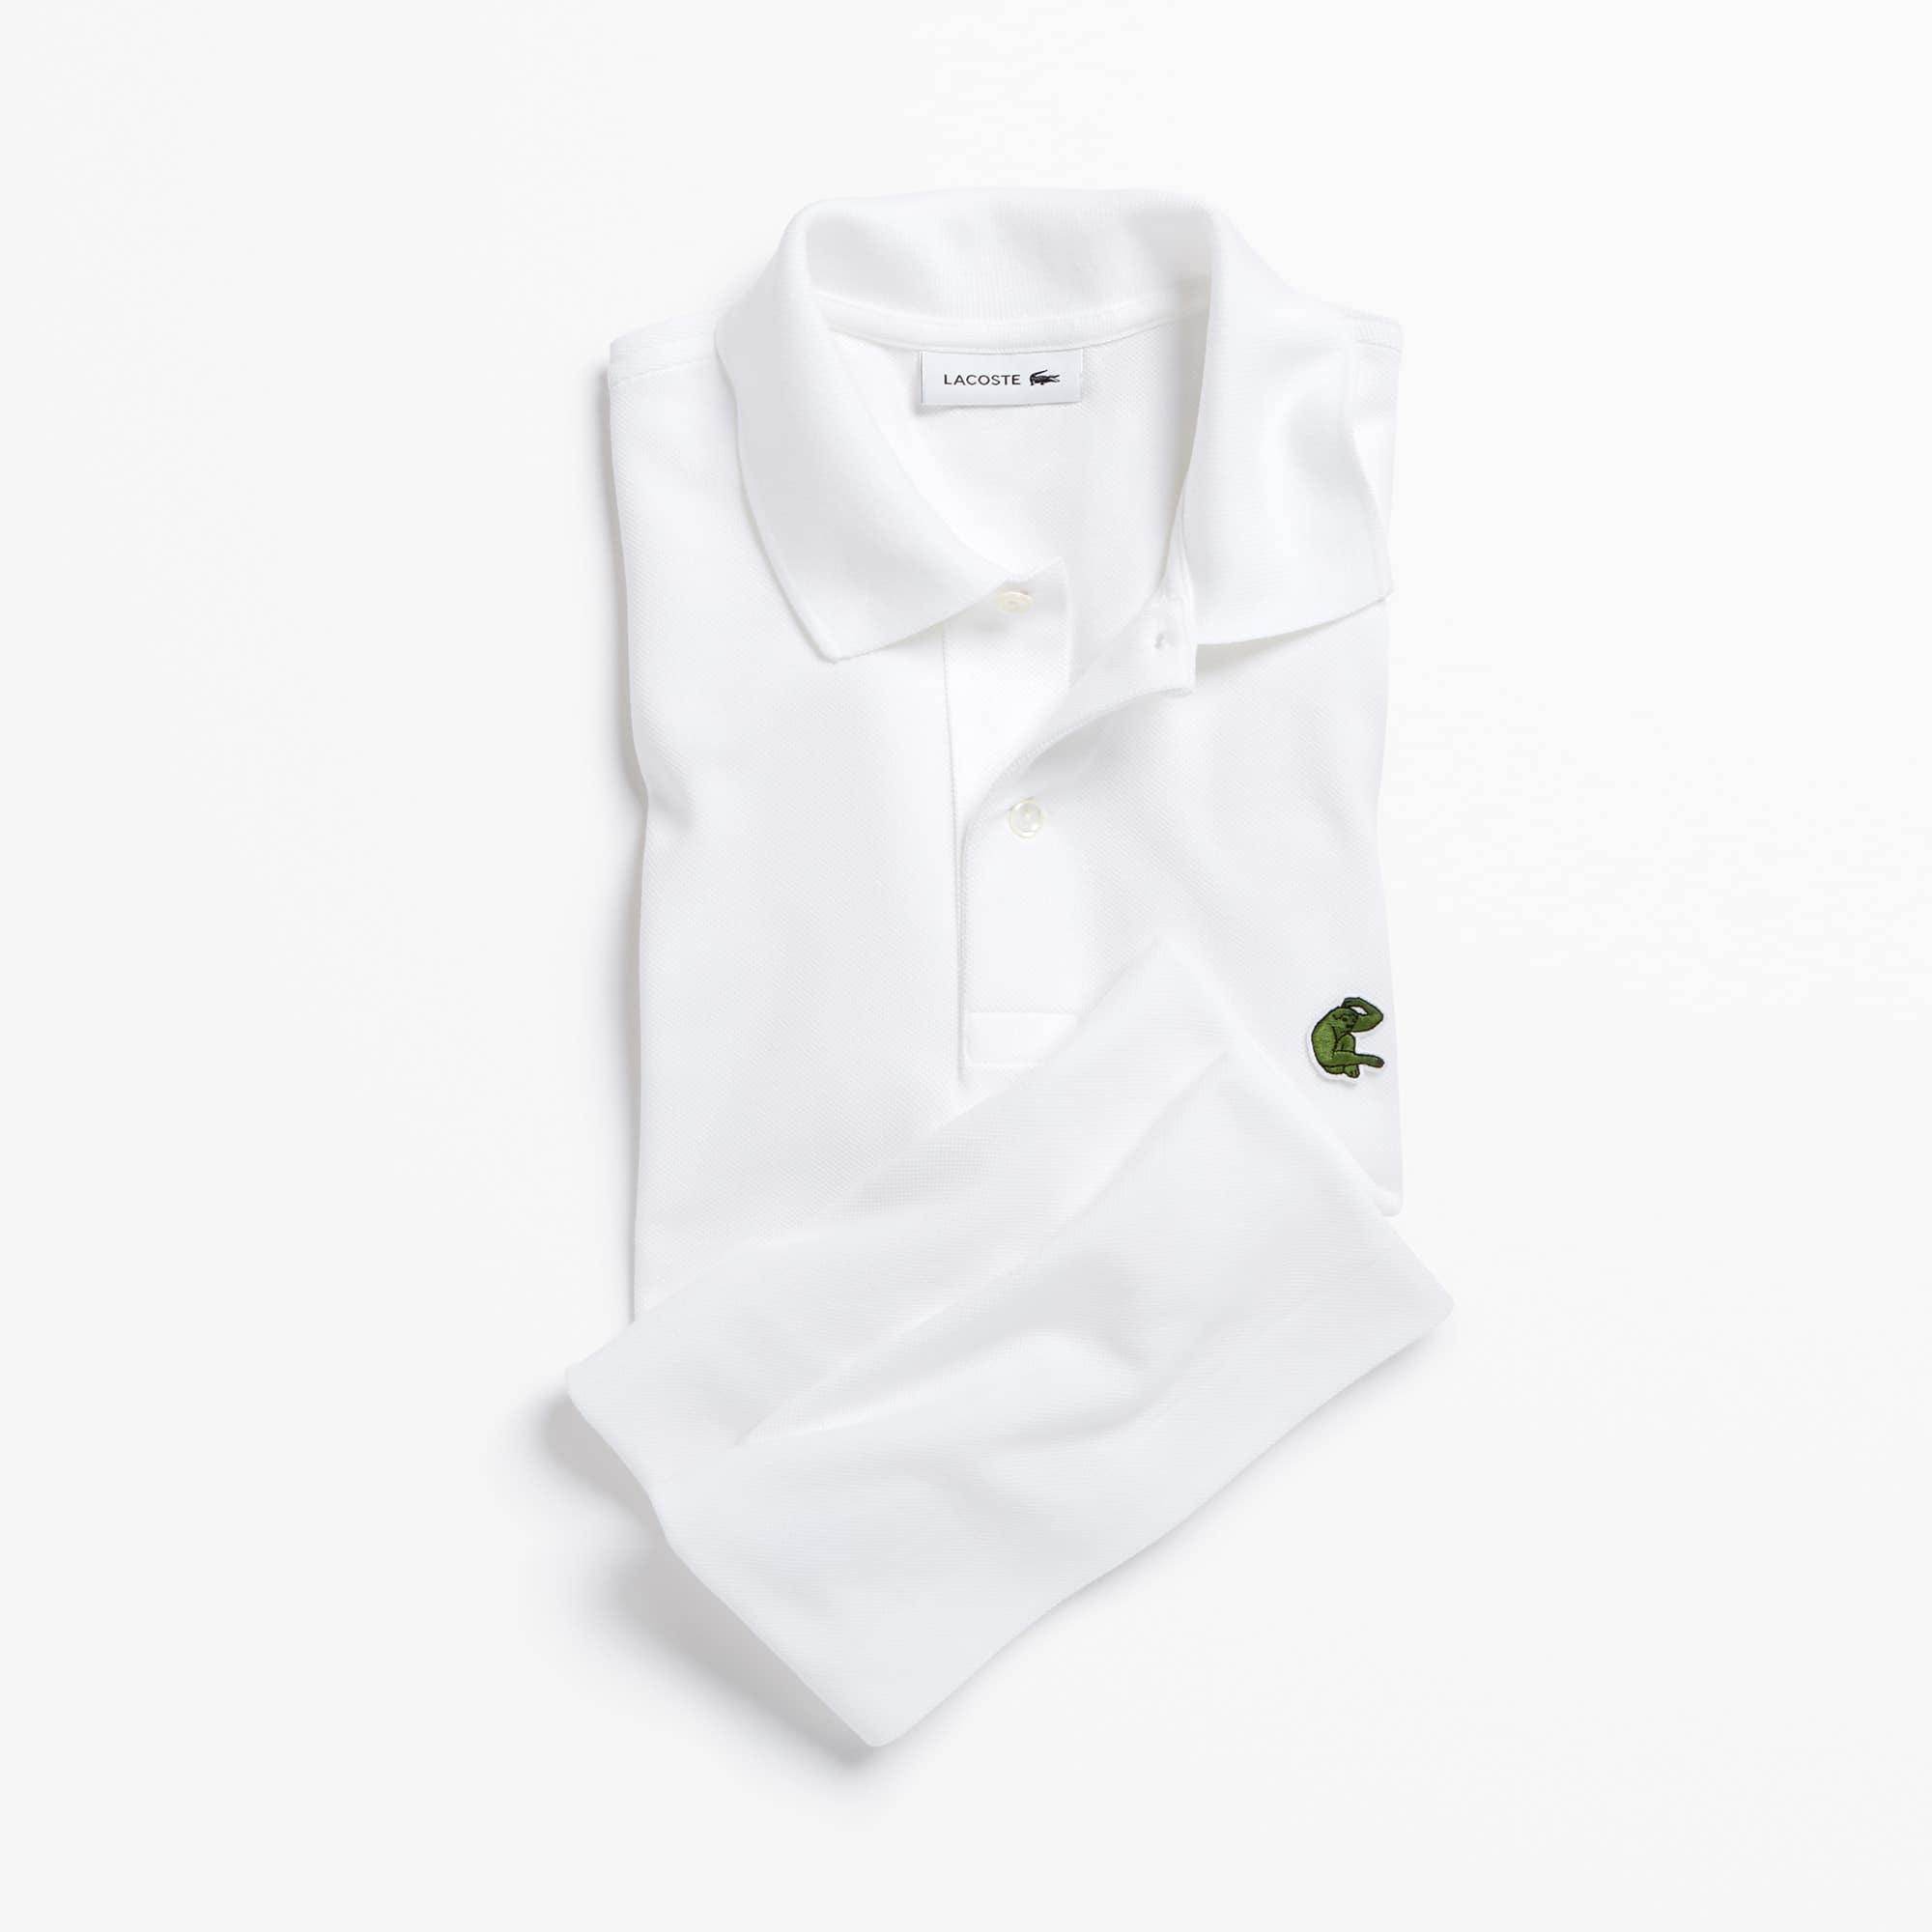 Polo Shirt Lacoste The Cao Vit Gibbon